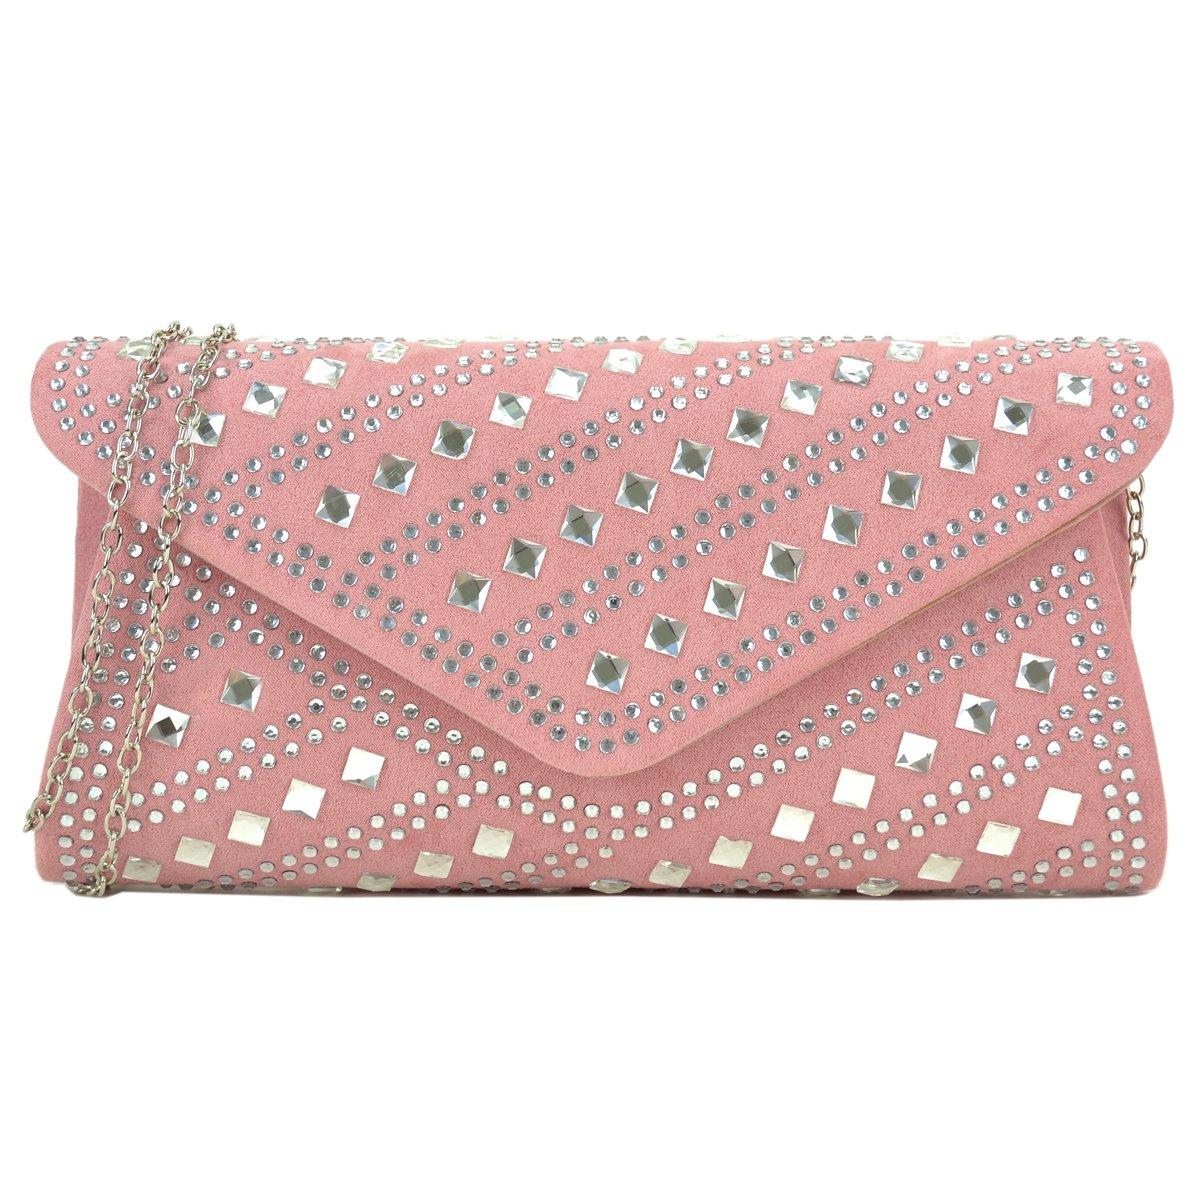 Dasein Rhinestone Evening Bag Glitter Clutch Purses Studded Envelope Shoulder Handbag Prom Party Bag